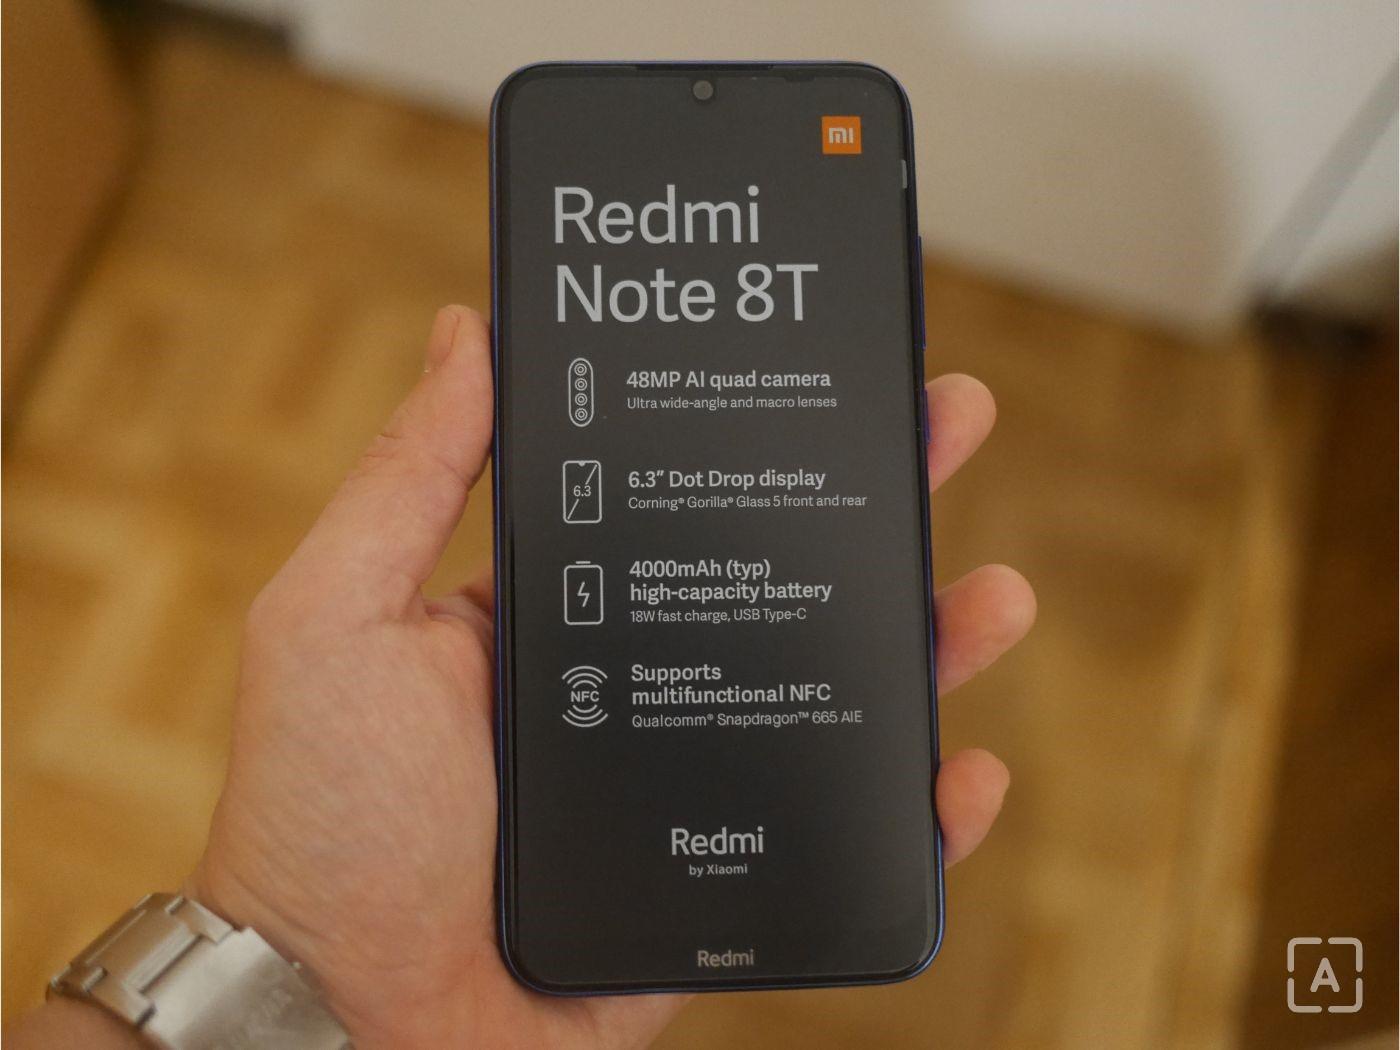 Redmi Note 8T fólia